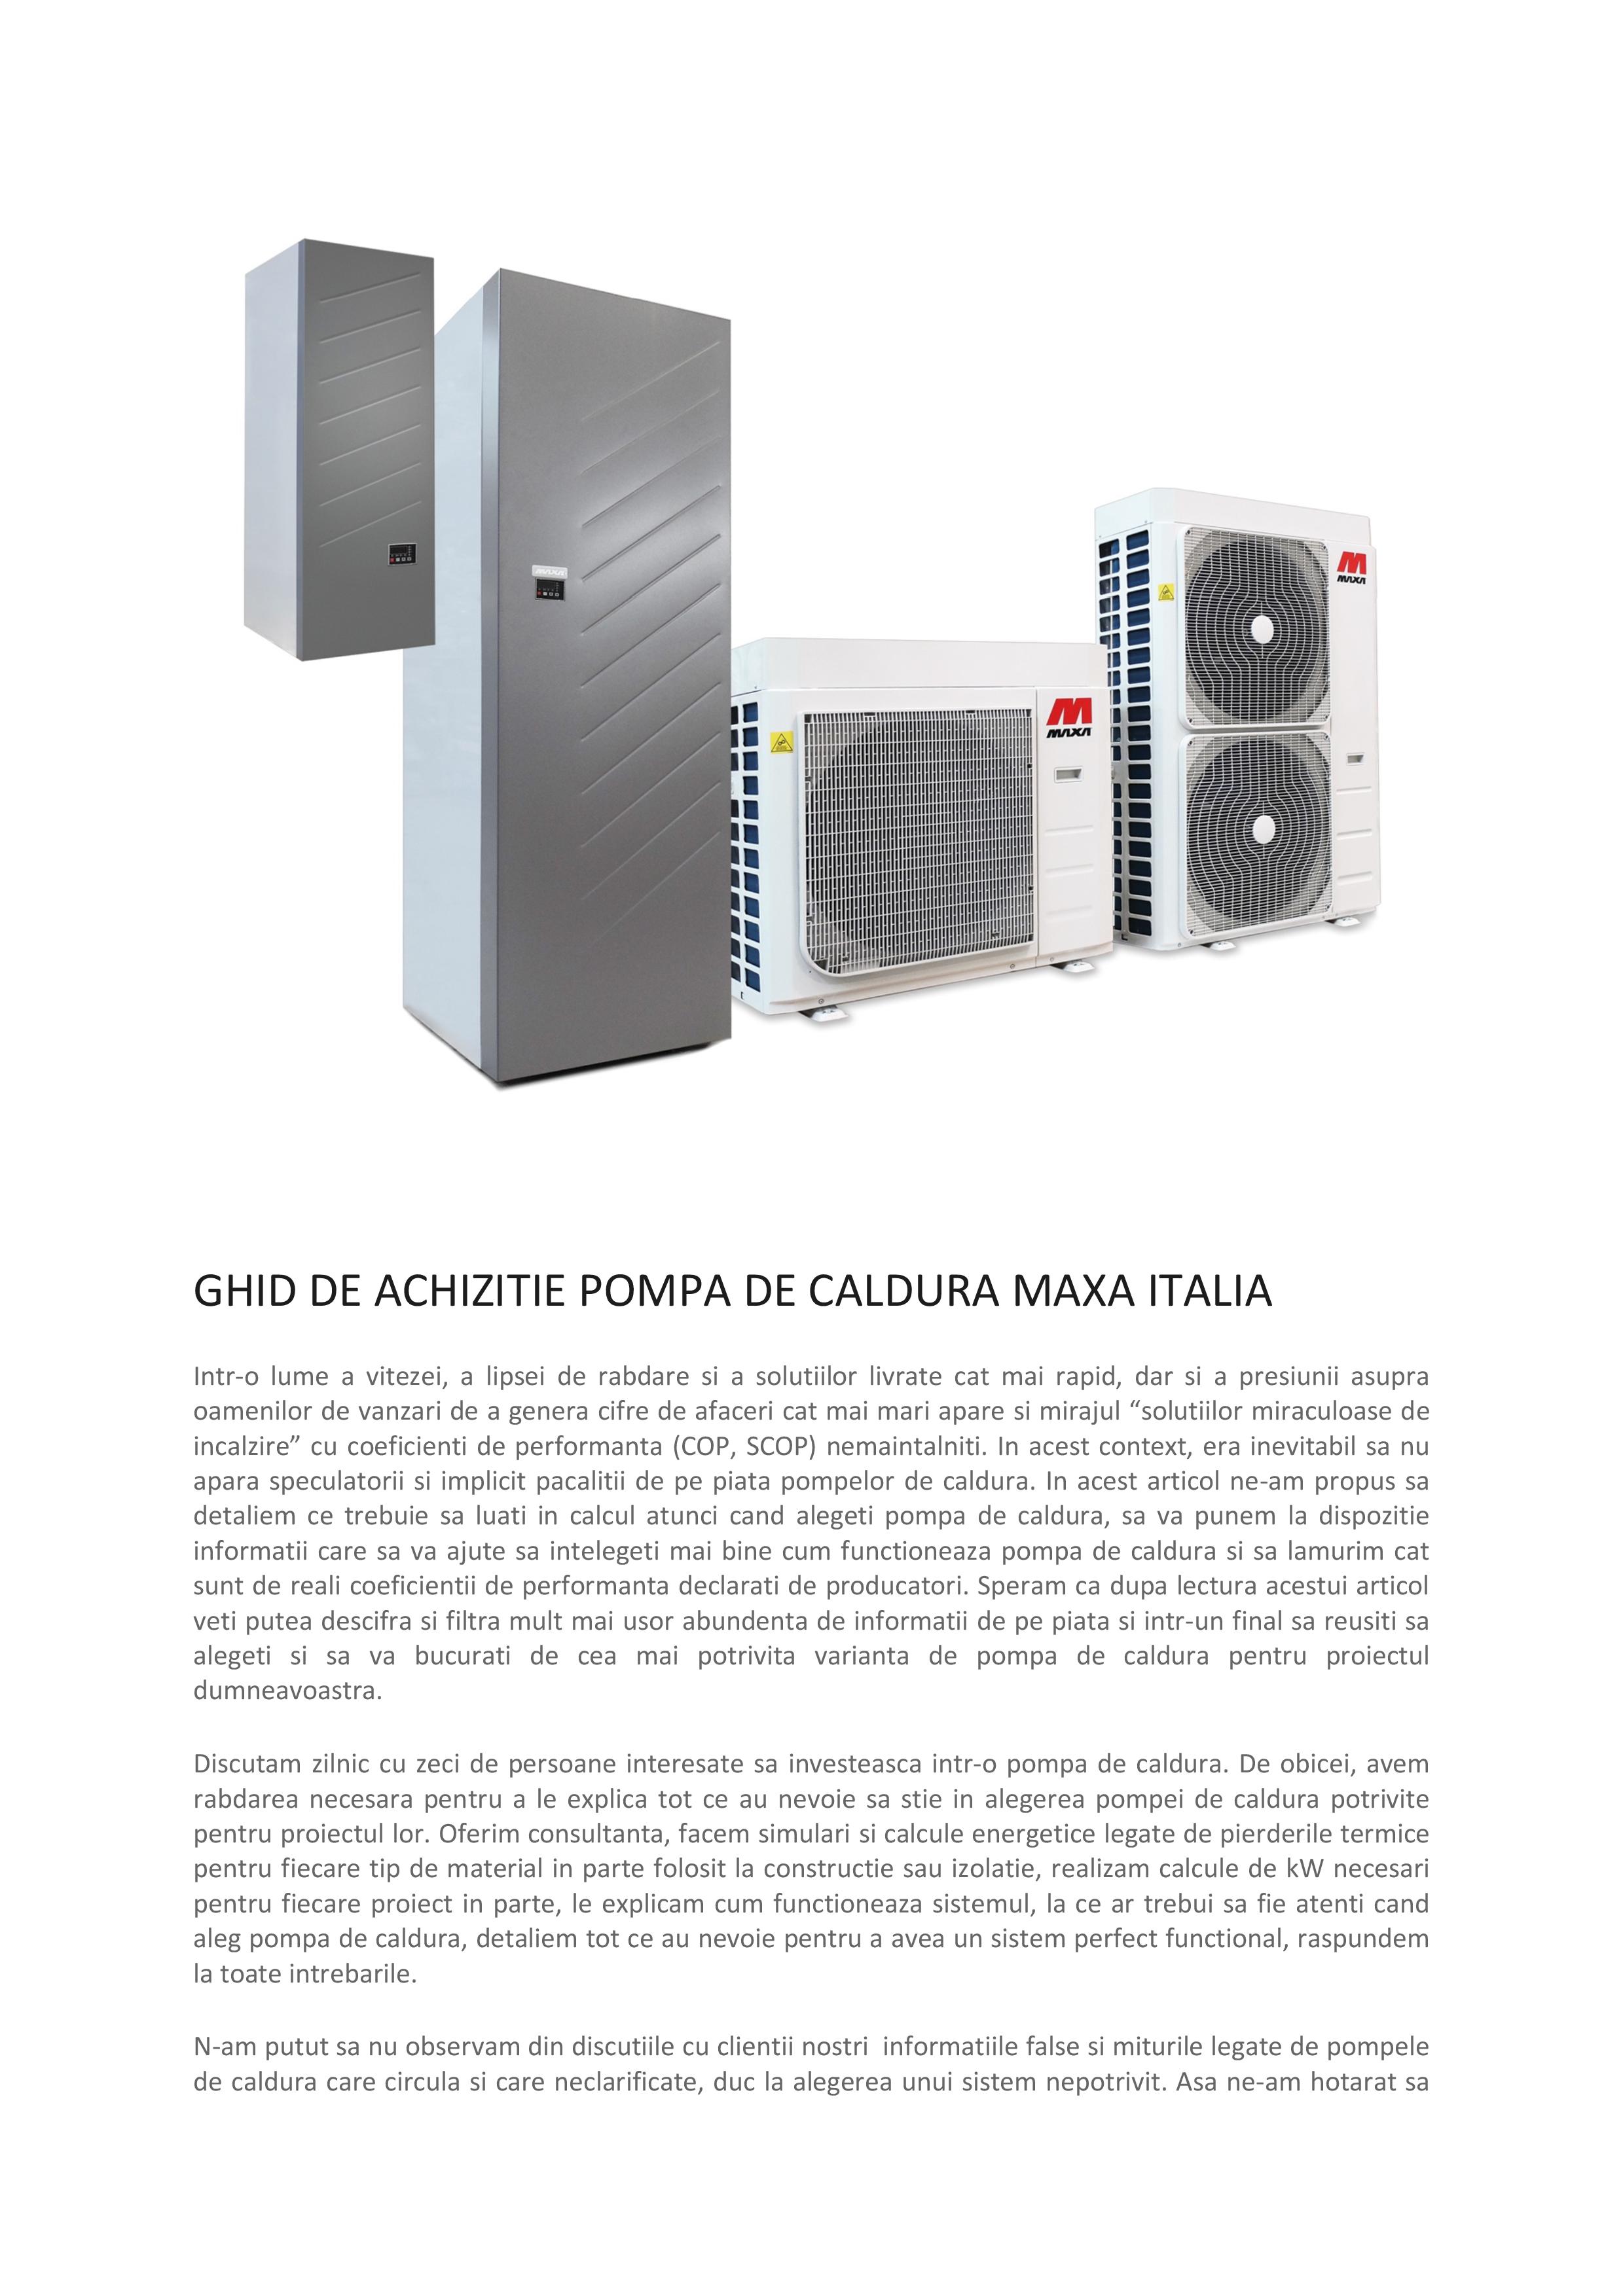 Pagina 1 - Ghid de achizitie pompa de caldura Maxa Italia